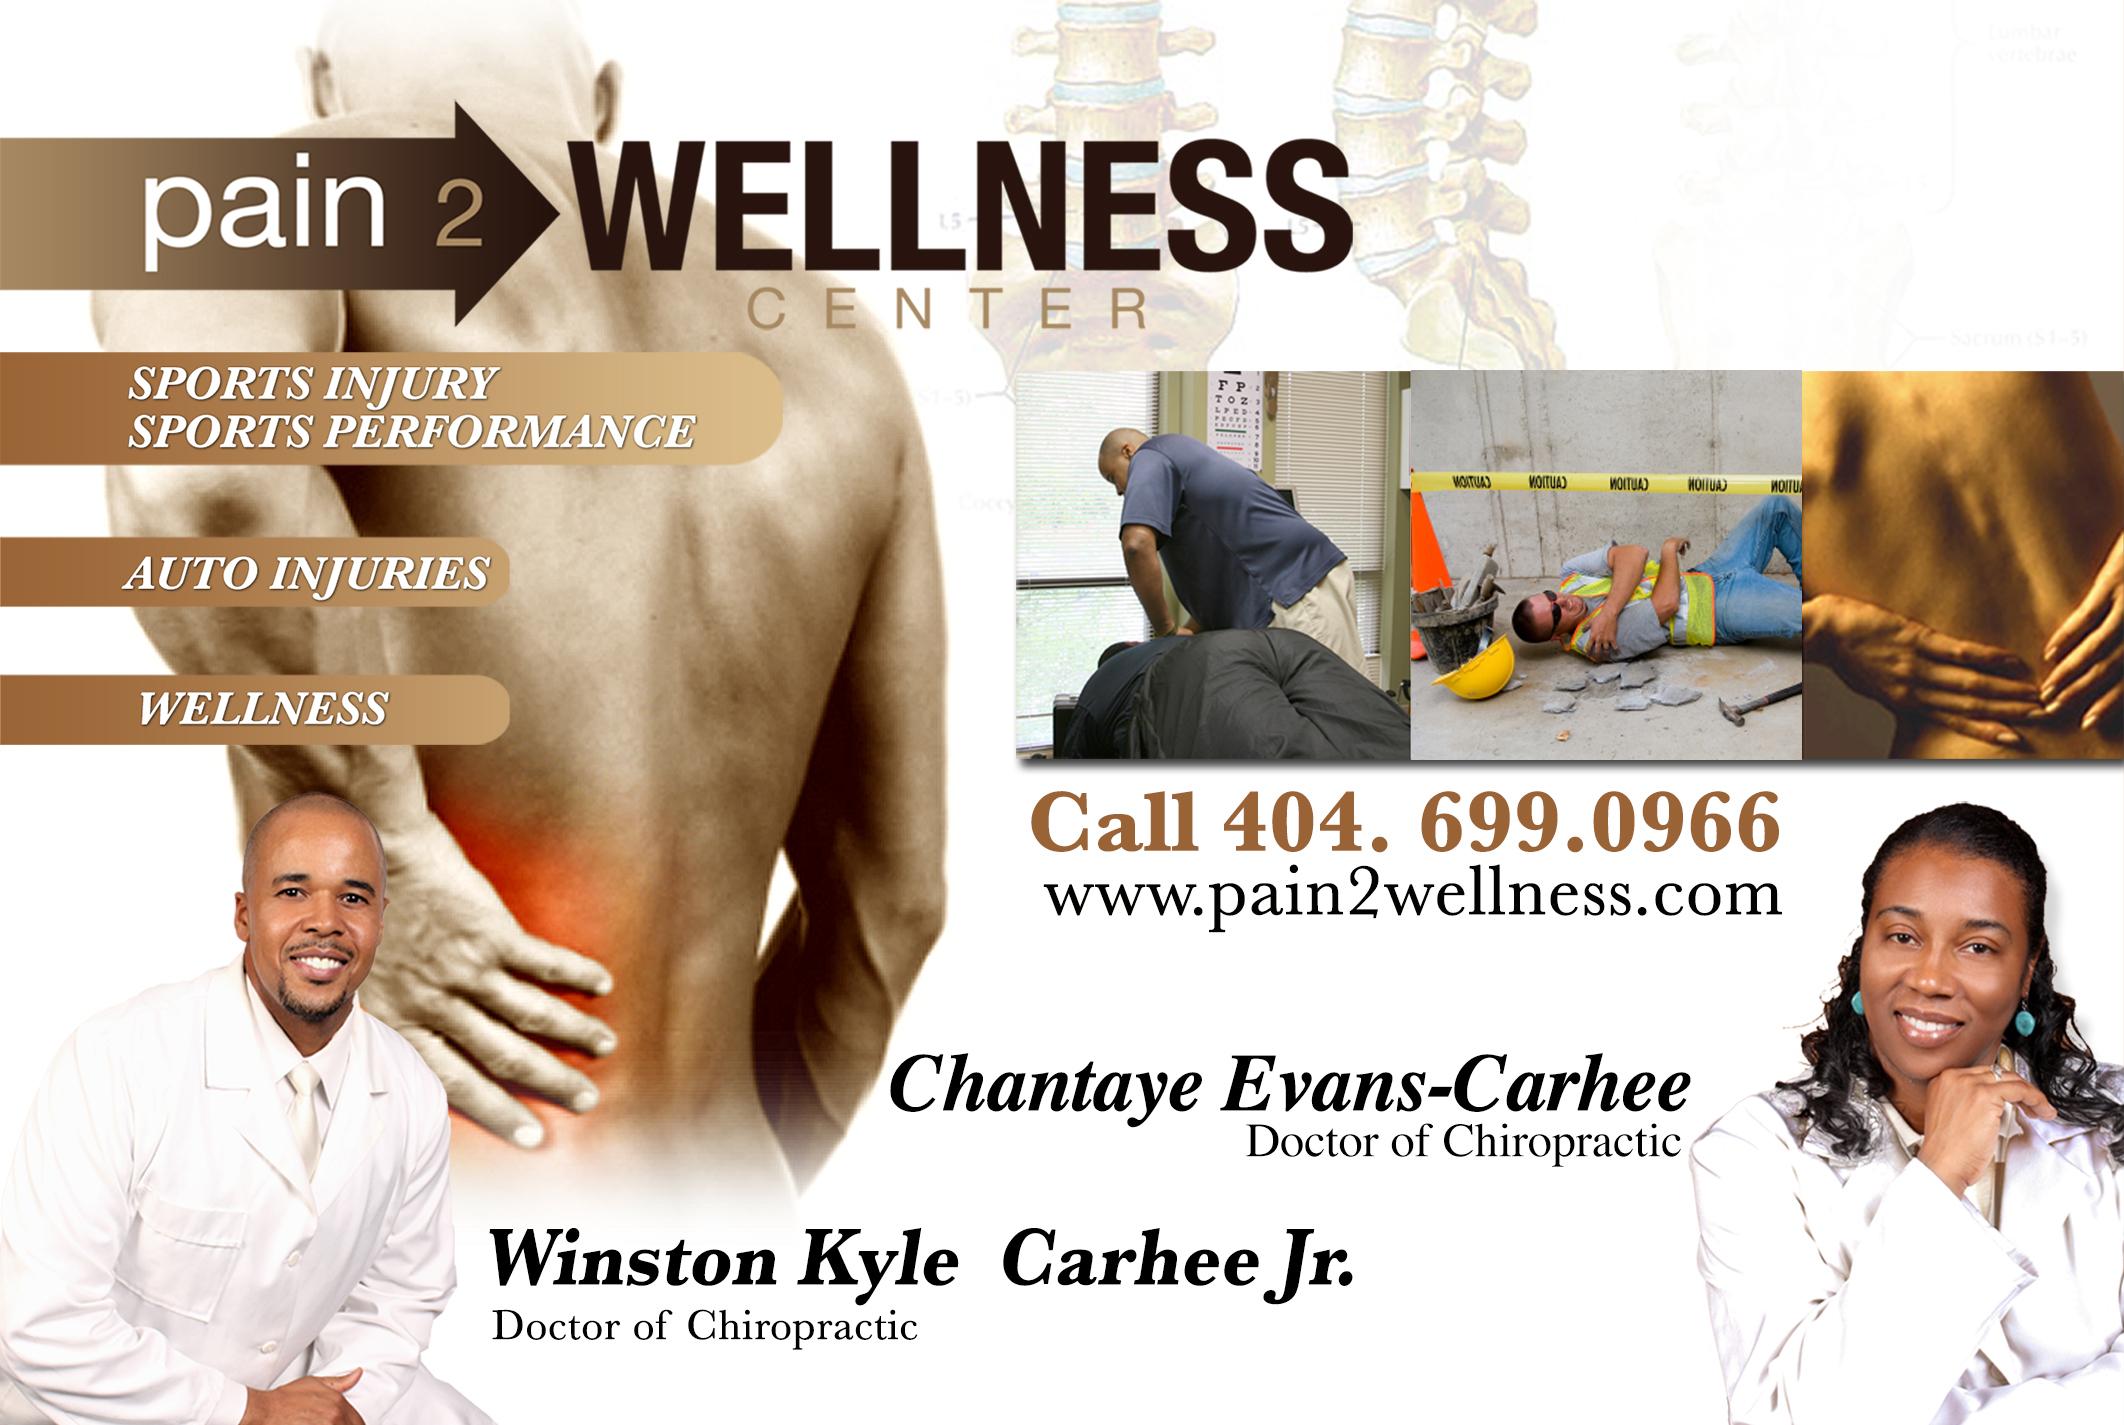 Pain 2 Wellness Center image 5